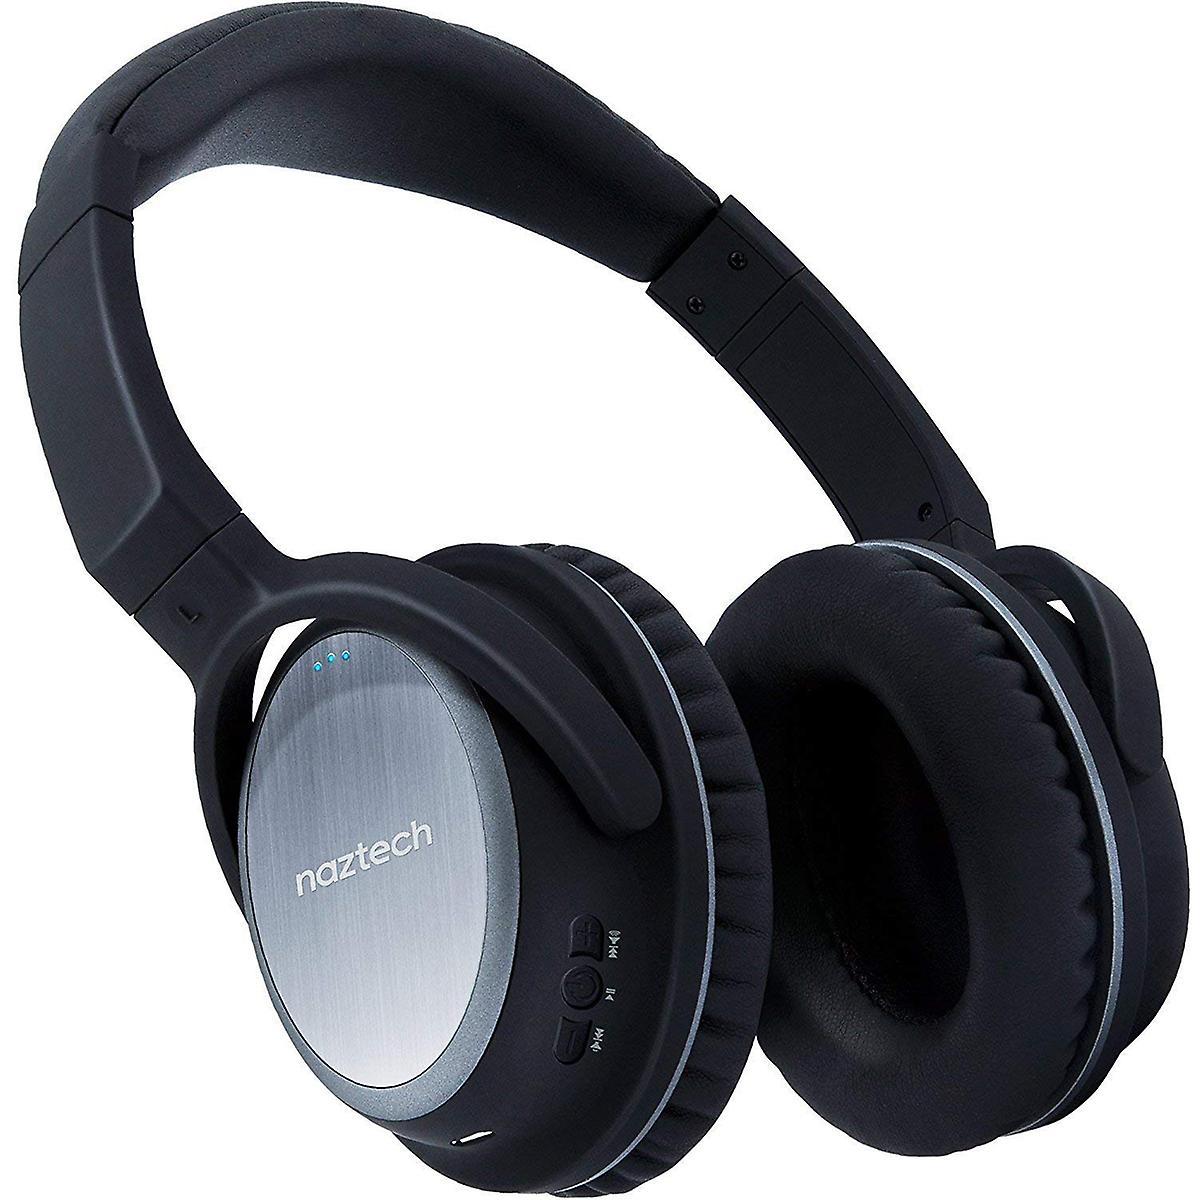 Sony Aural Circum Casque Zx770bn Bluetooth Mdr Qmjzglsvup